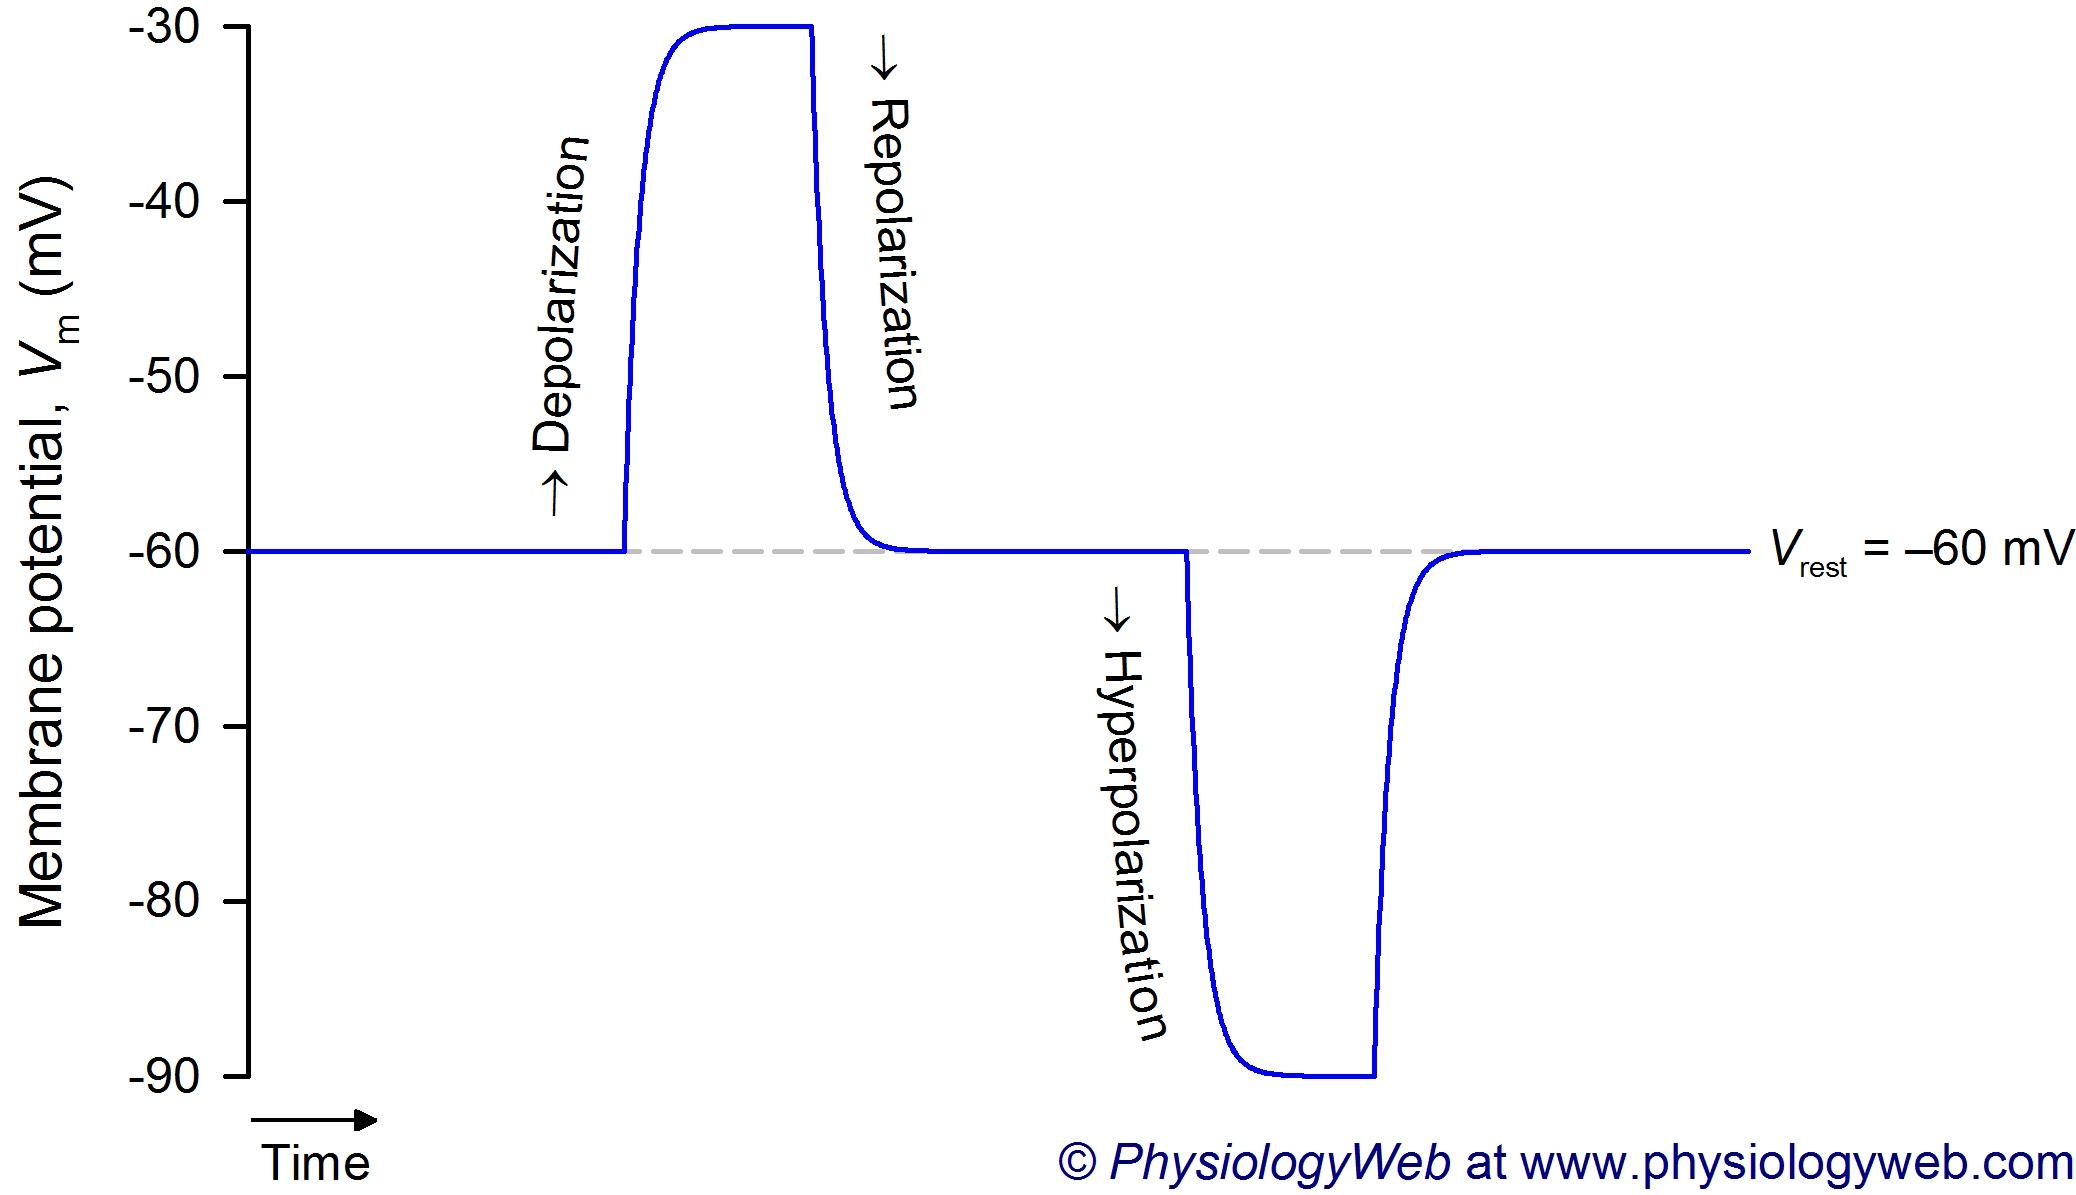 Depolarization, repolarization, and hyperpolarization